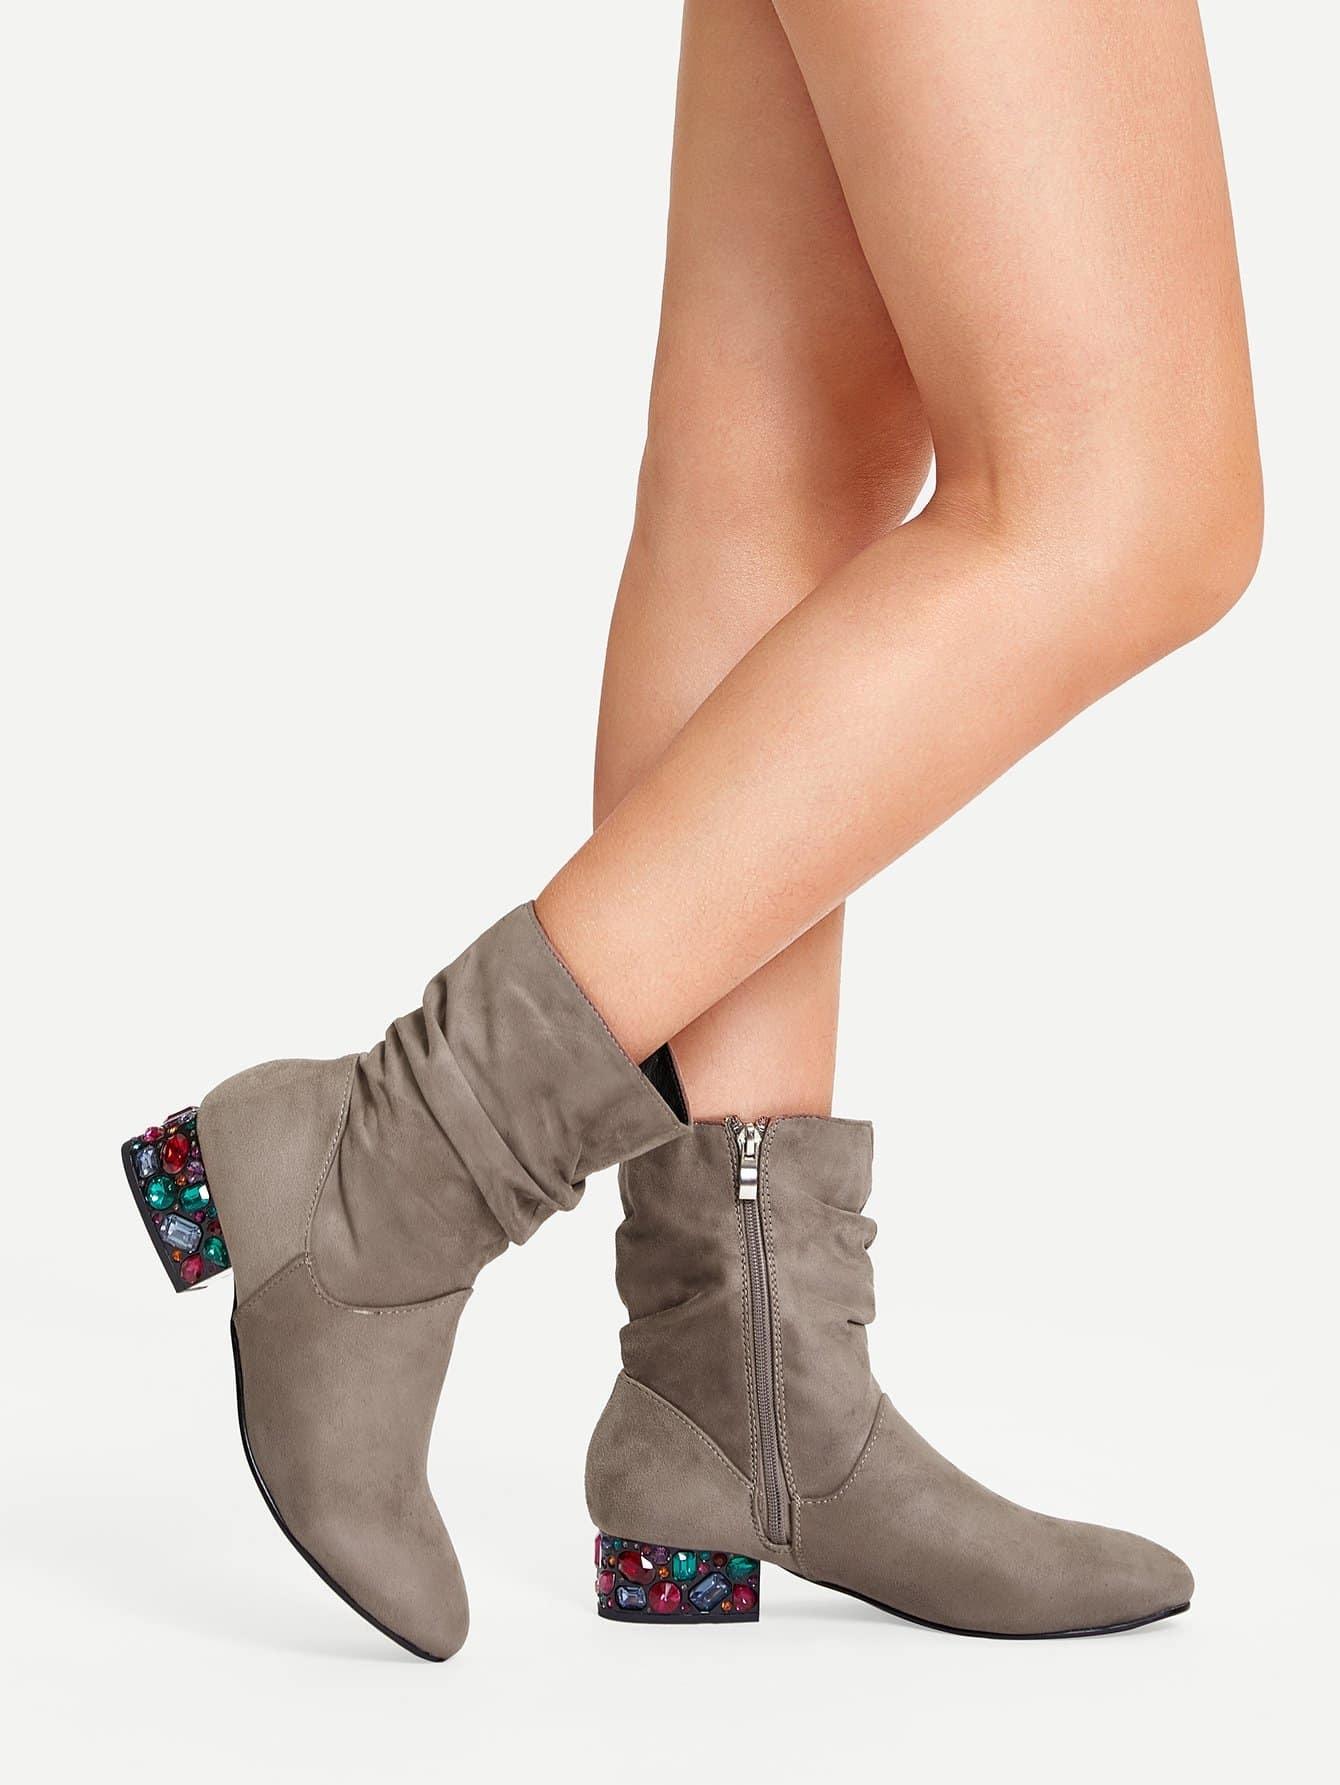 Фото - Ботинки со стразом от SheIn серого цвета